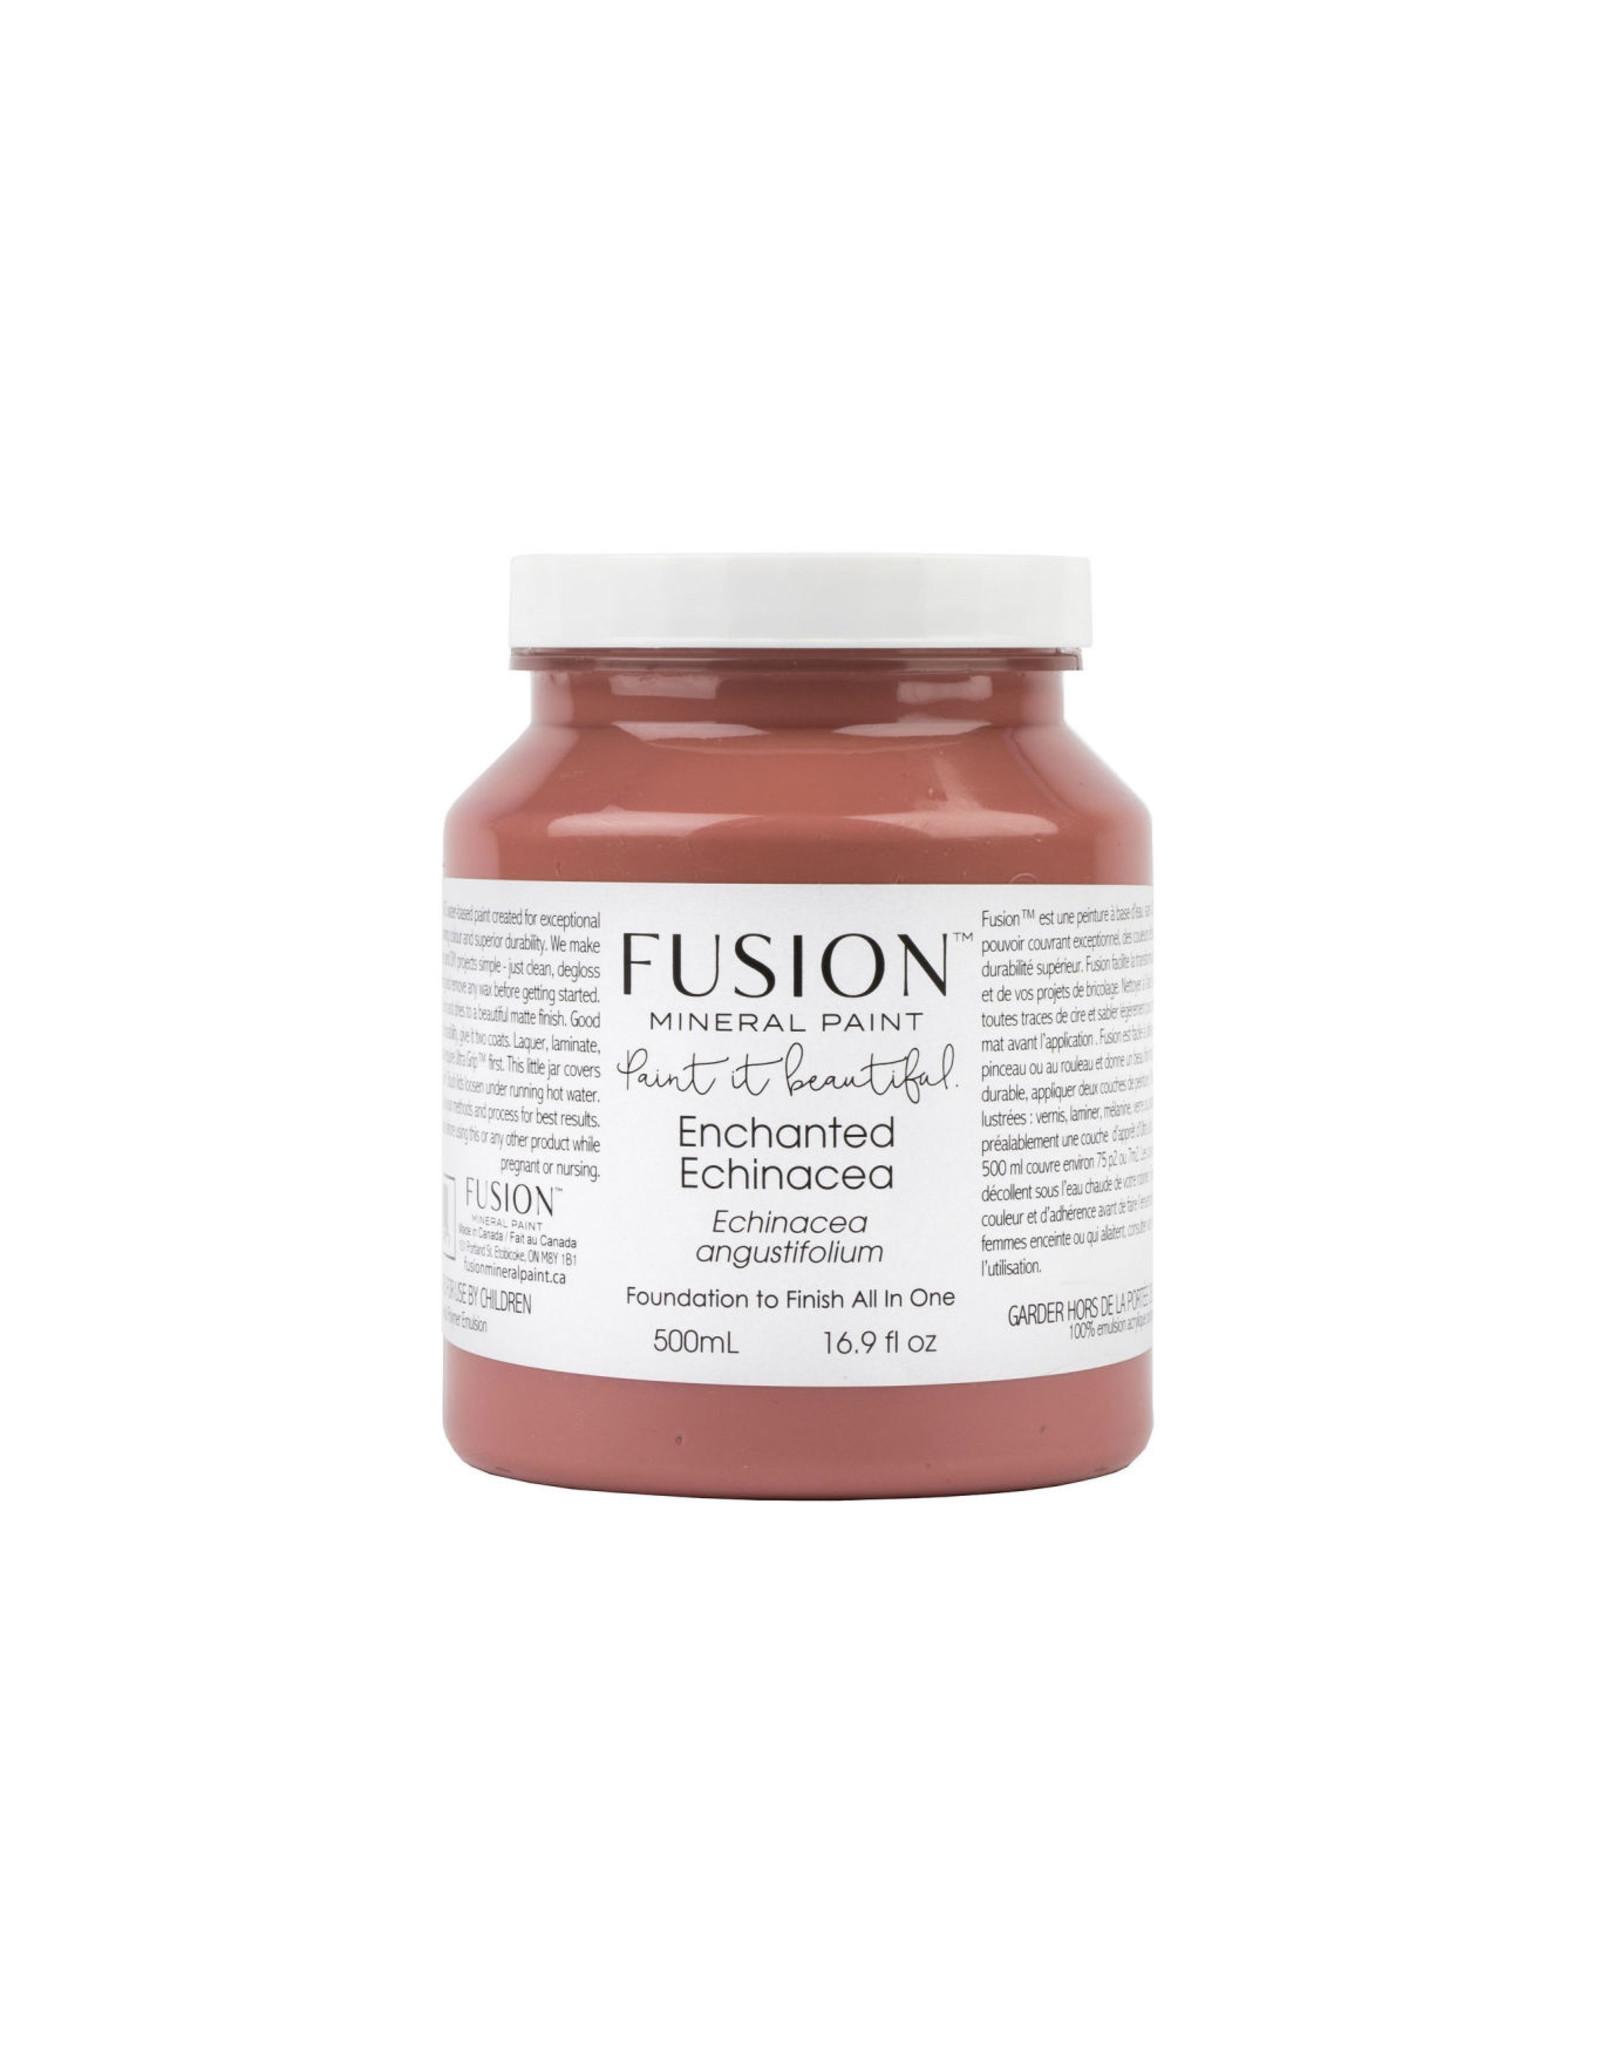 Fusion Mineral Paint Fusion Mineral Paint - Enchanted Echinacea 500ml